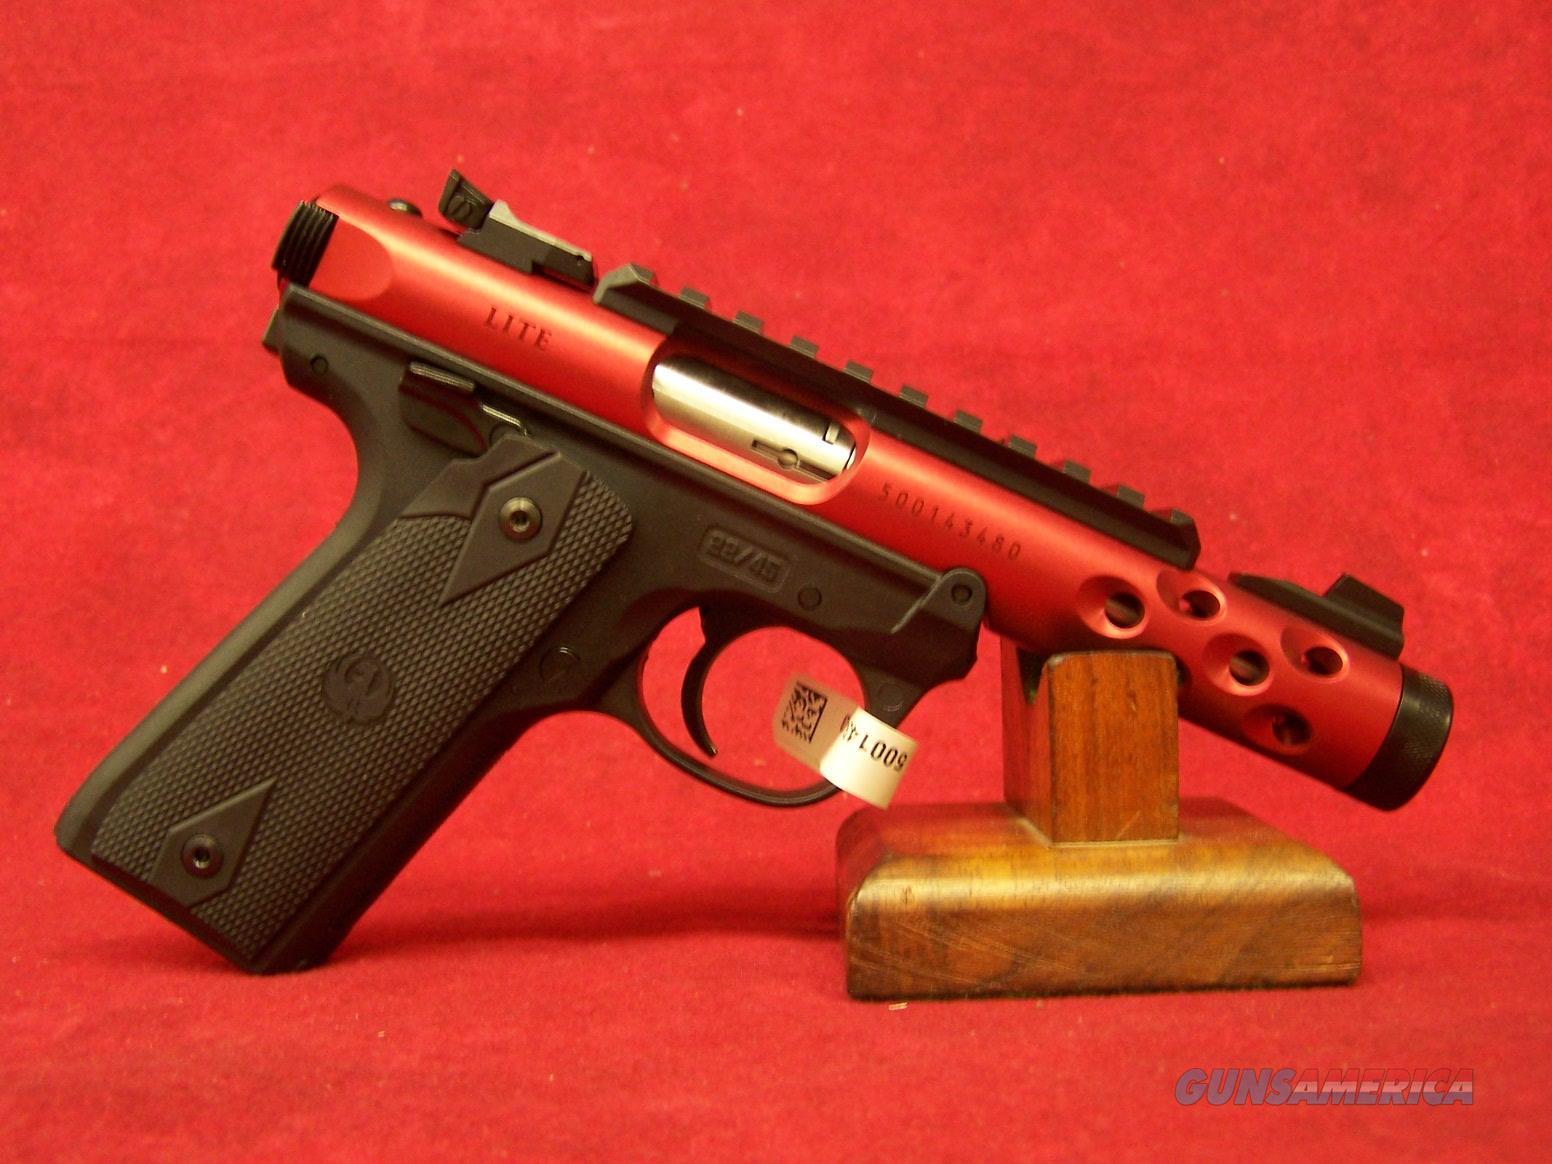 "Ruger Mark IV 22/45 Red Anodized .22LR 4.4"" (43910)  Guns > Pistols > Ruger Semi-Auto Pistols > Mark I/II/III/IV Family"